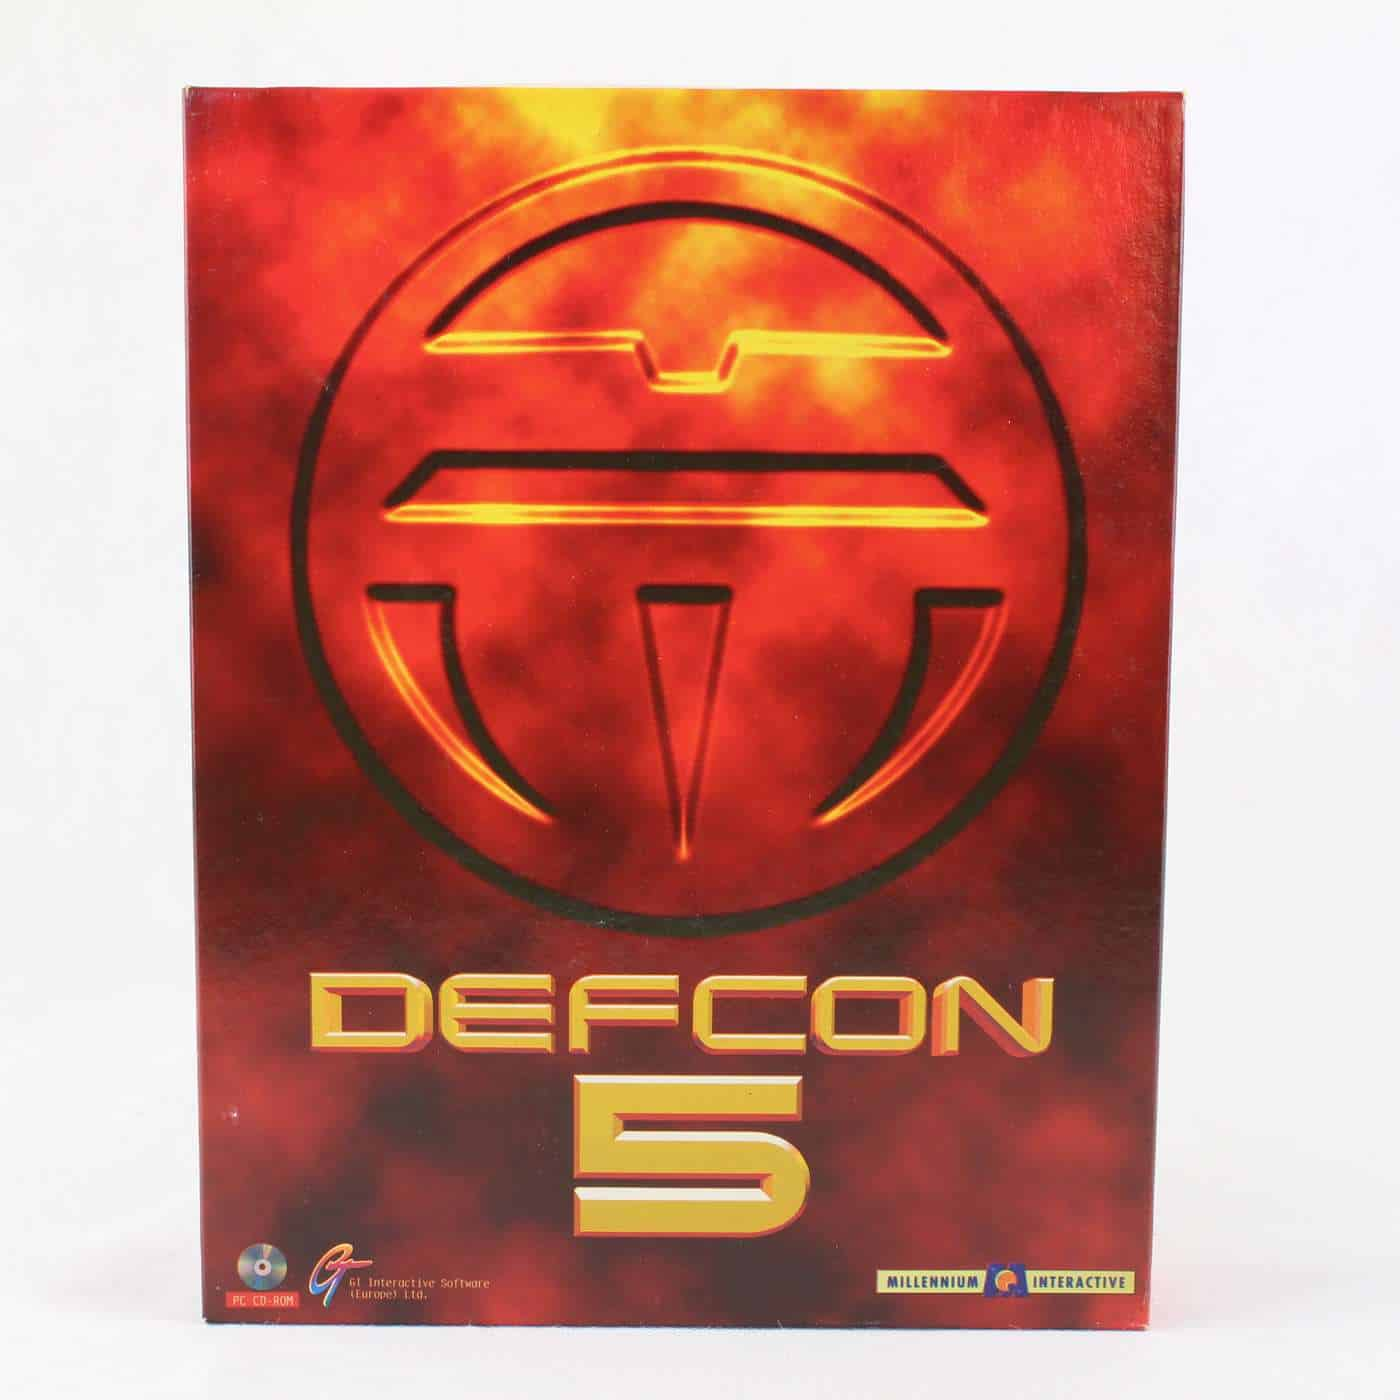 Defcon 5 (PC Big Box, 1995, Millennium Interactive)